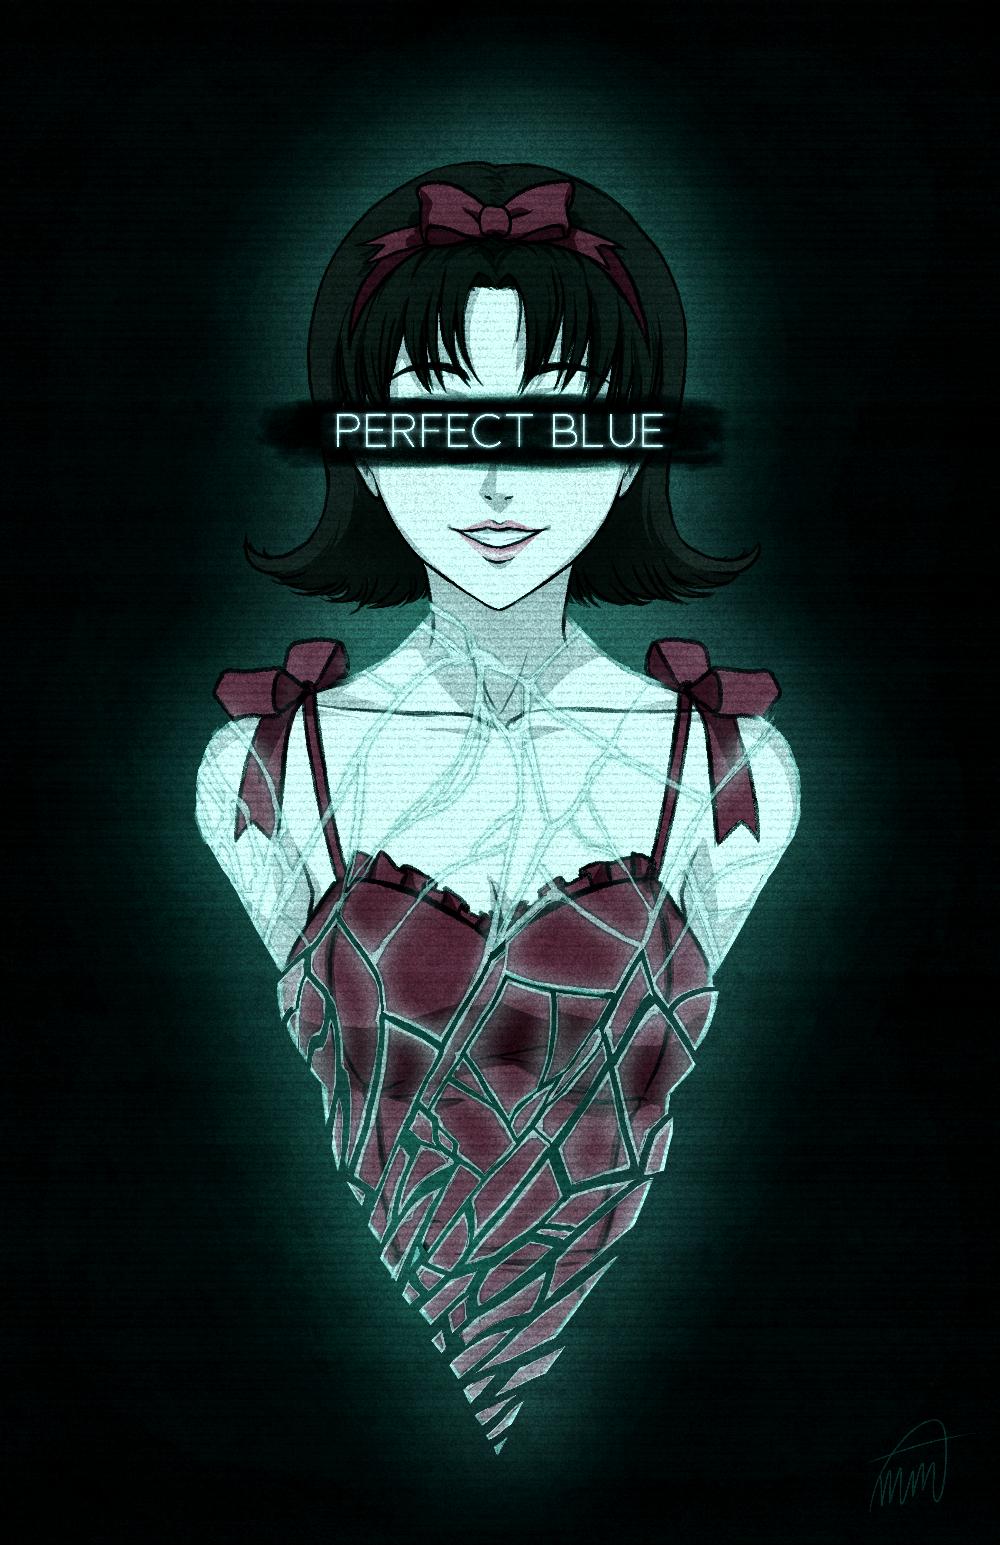 Mima Kirigoe Perfect Blue By Sketchmenot Art On Deviantart Blue Digital Art Blue Anime Anime Movies